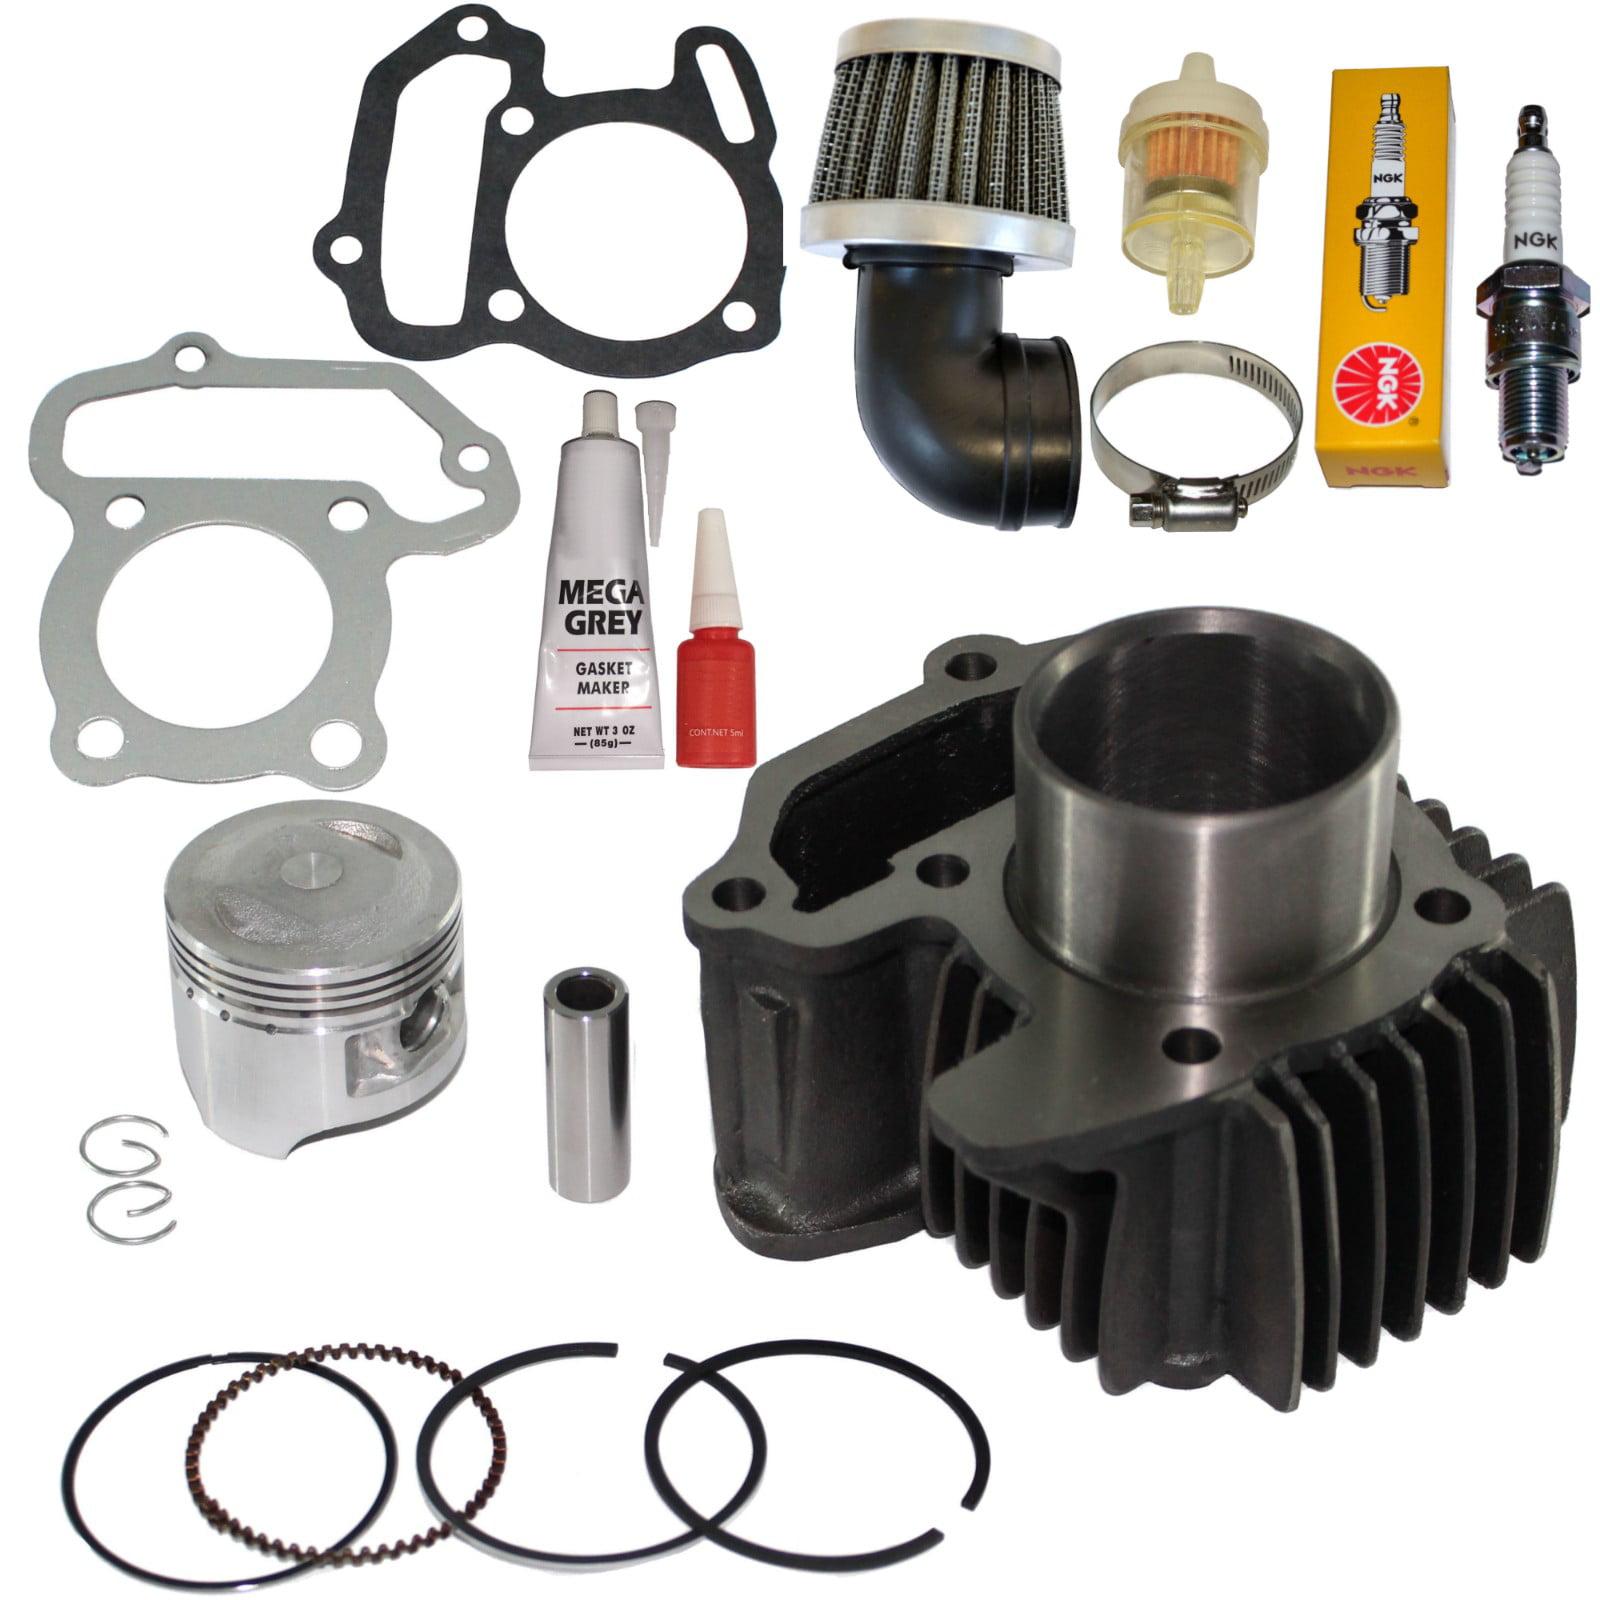 Top Notch Parts Yamaha Badger 80 Yfm 80 Cylinder Piston Rings Gaskets Pin Clips Kit 1985 - 2001